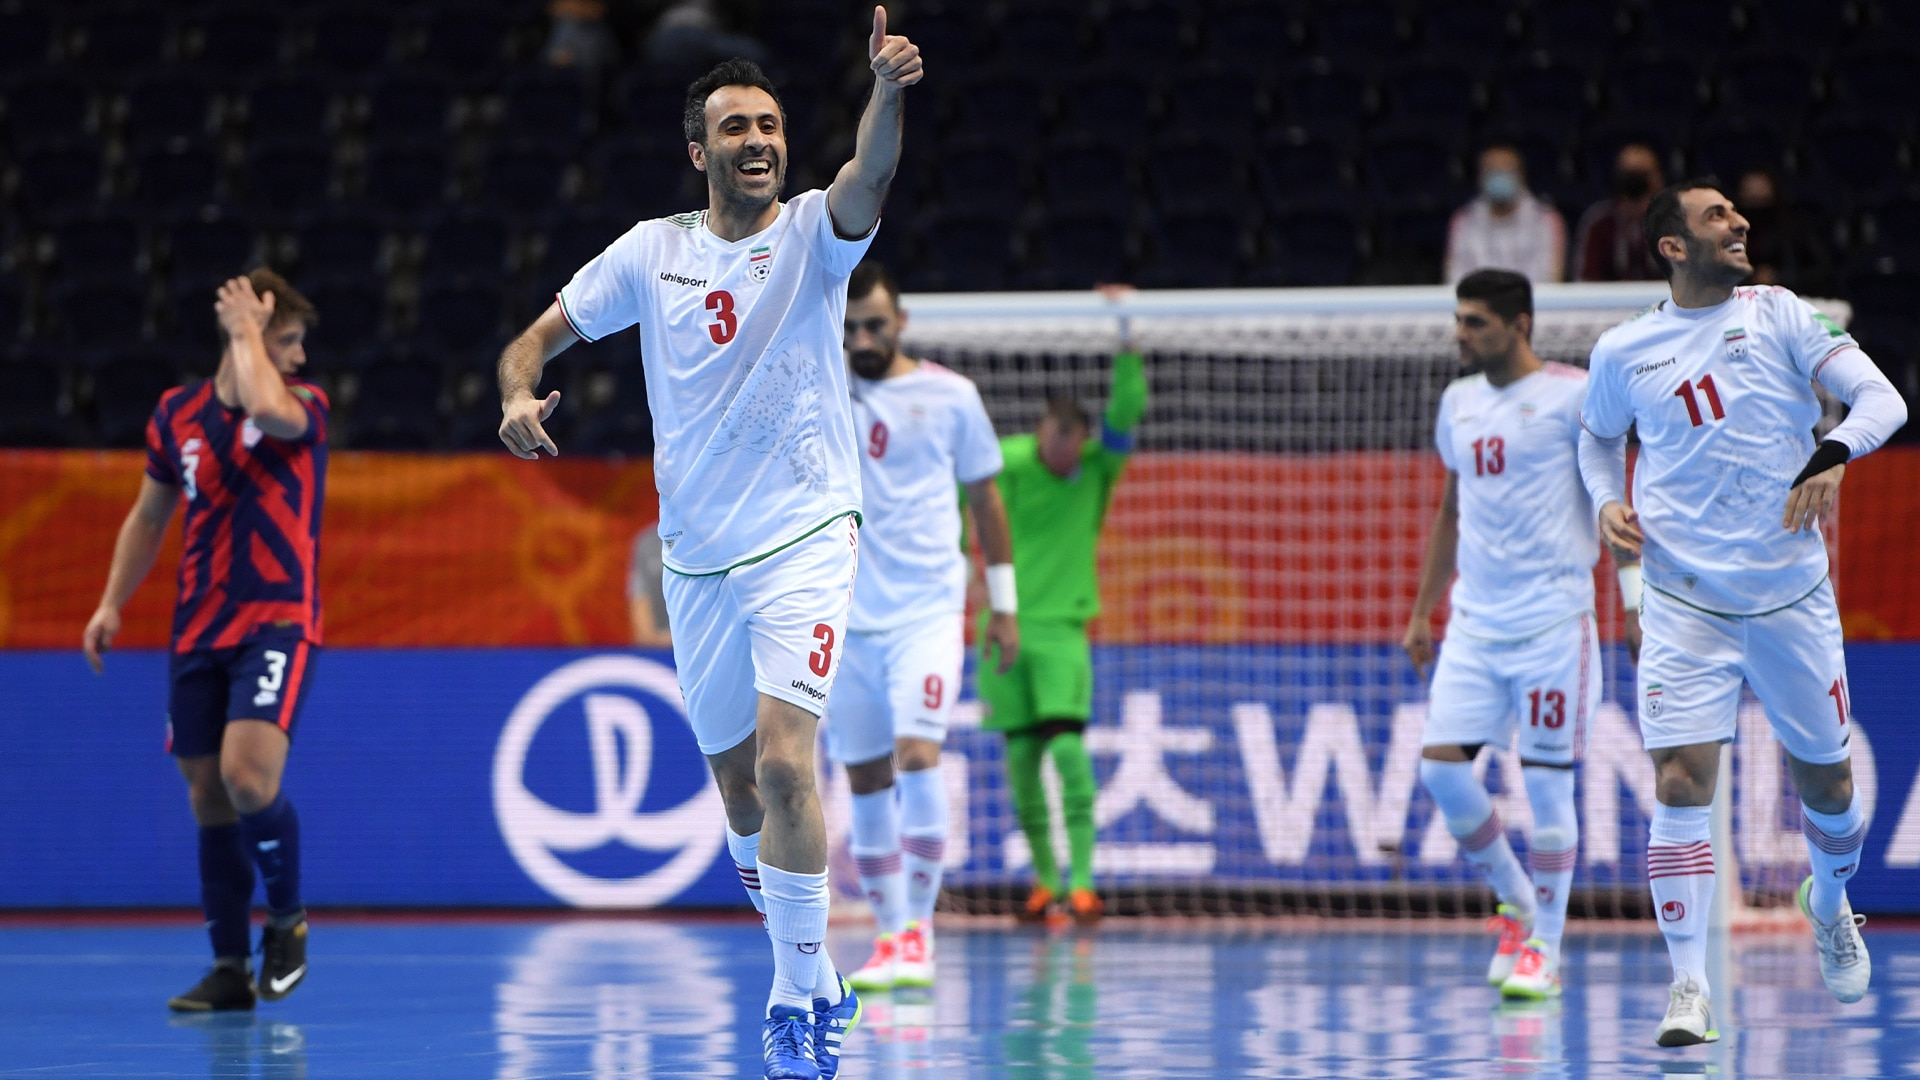 Watch FIFA Futsal World Cup Lithuania 2021 Highlight: Ri de Irán vs. EE.UU. 4-2 - NBC.com